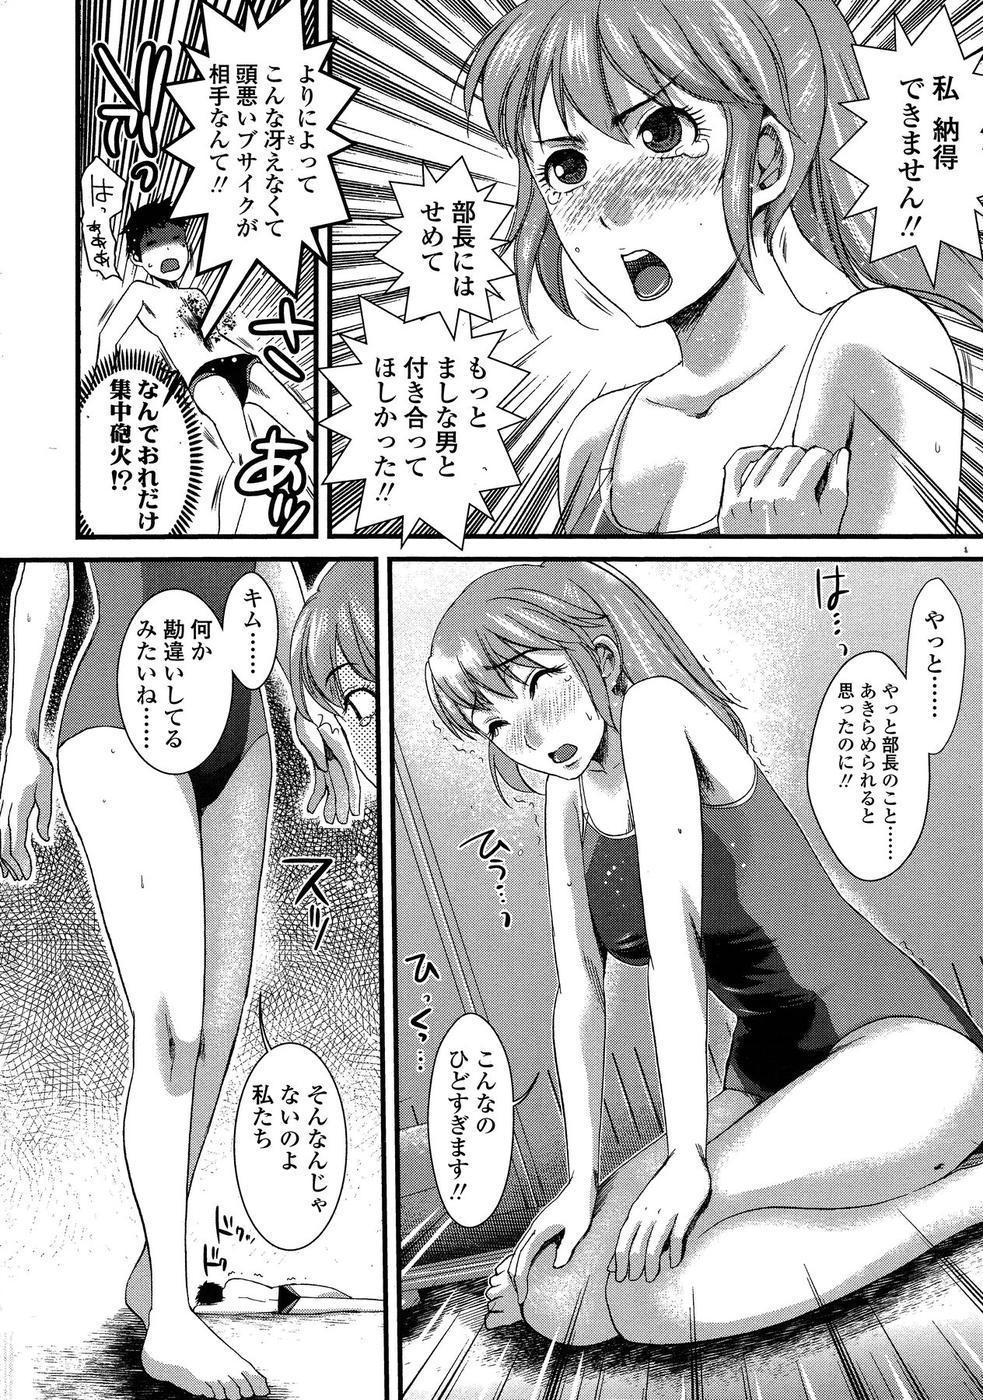 COMIC SIGMA 2009-01 Vol.28 8